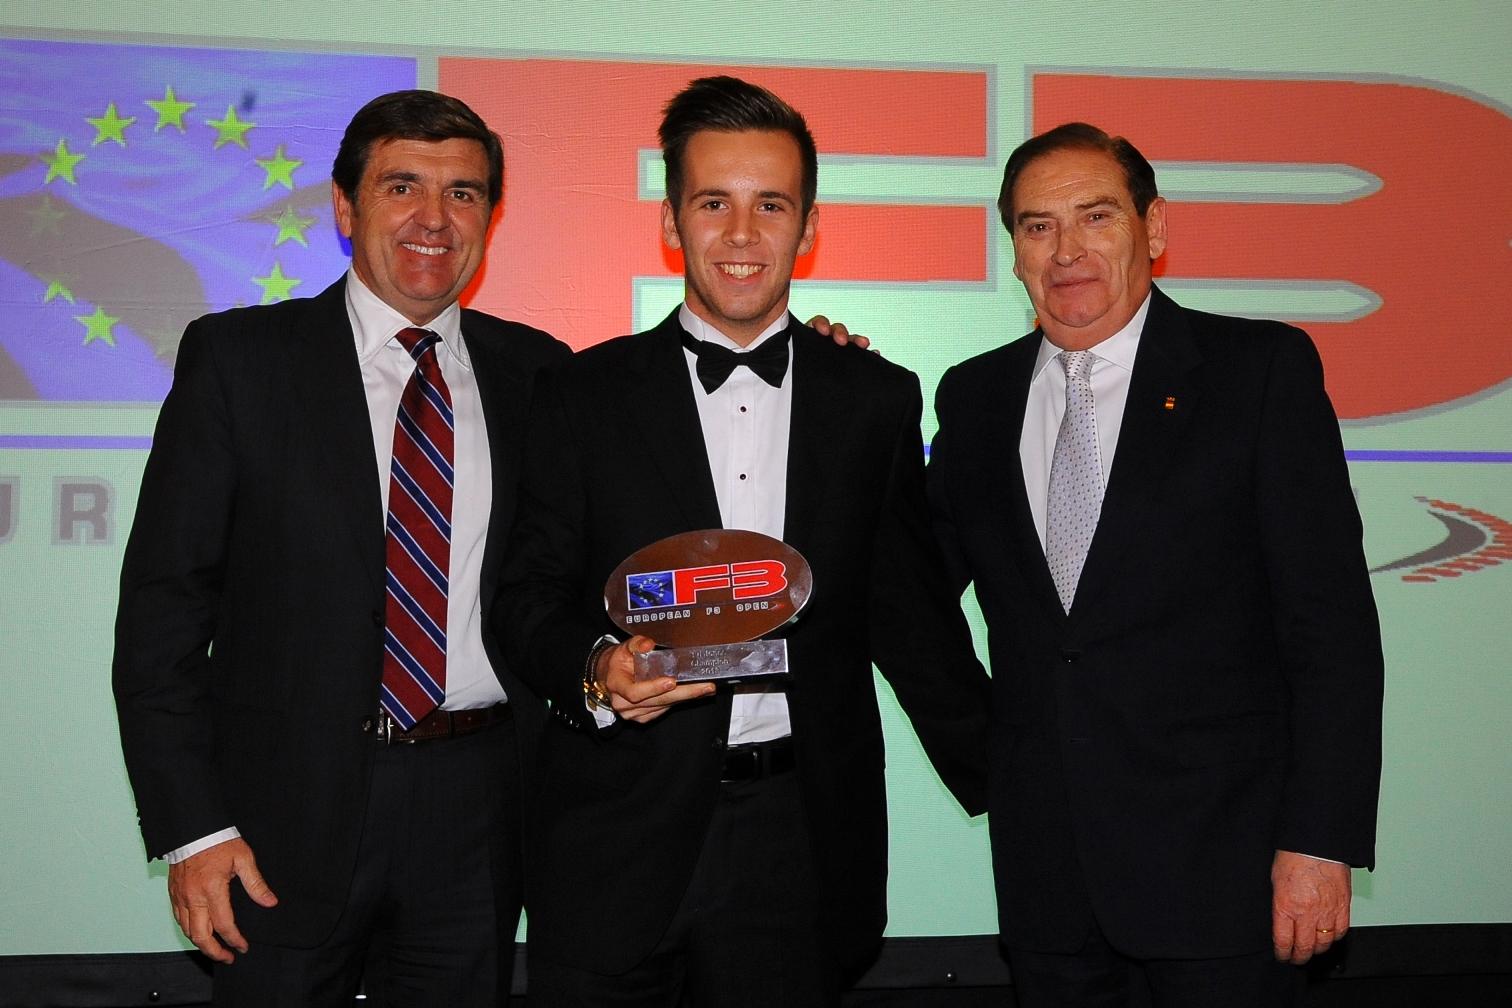 UAE: Dubai's Ed Jones receives F3 Open Champions trophy in Monaco